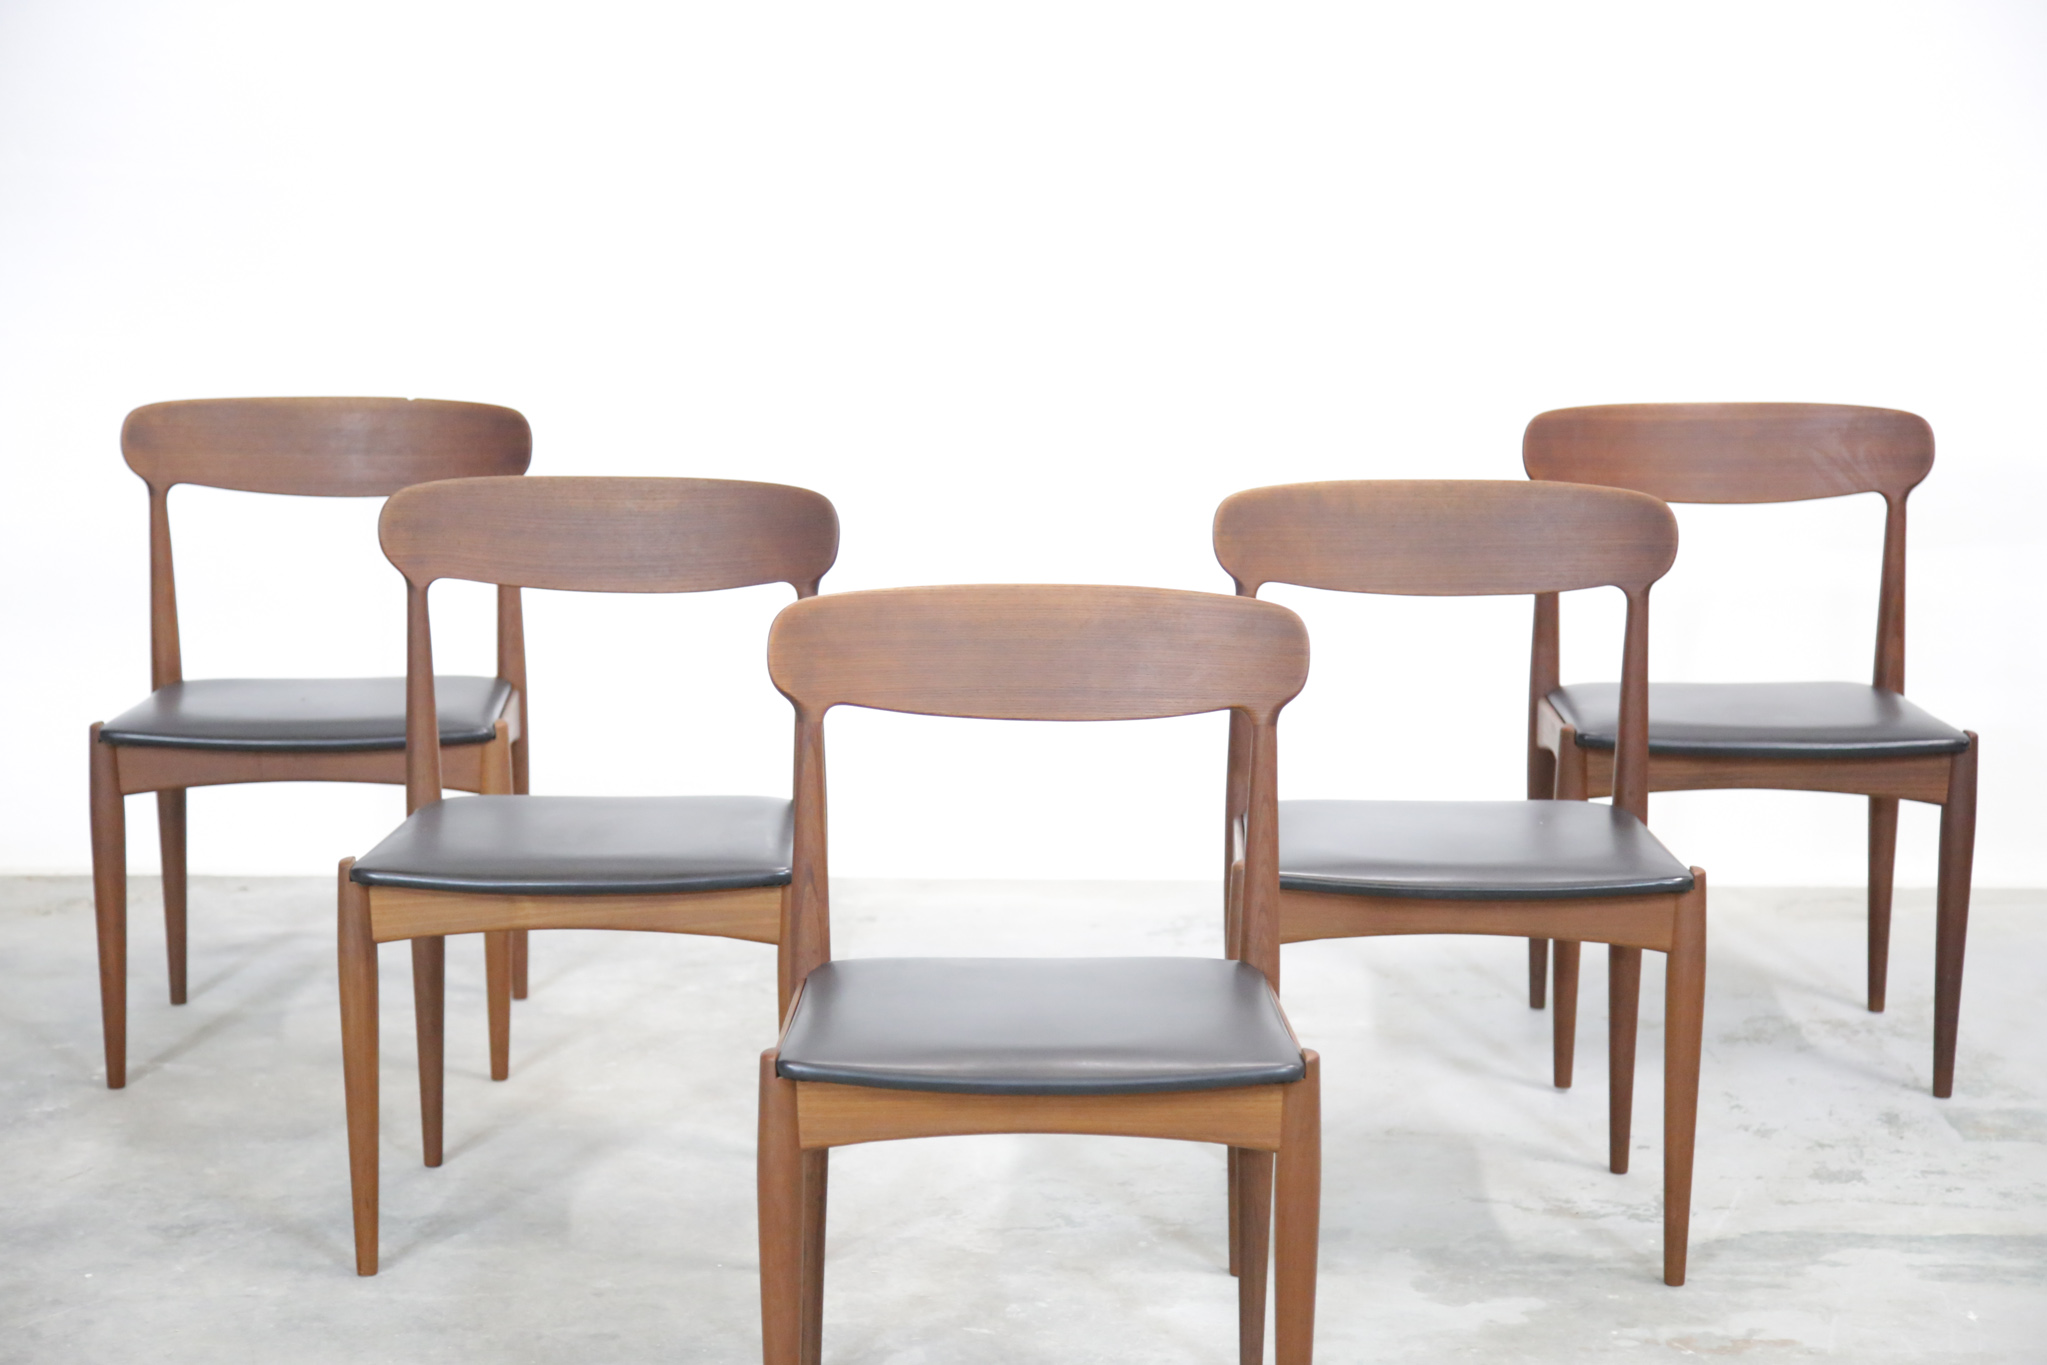 Chair Danke Johannes Suite – Andersen De Danoise 5 Chaises Dining lcFJTK13